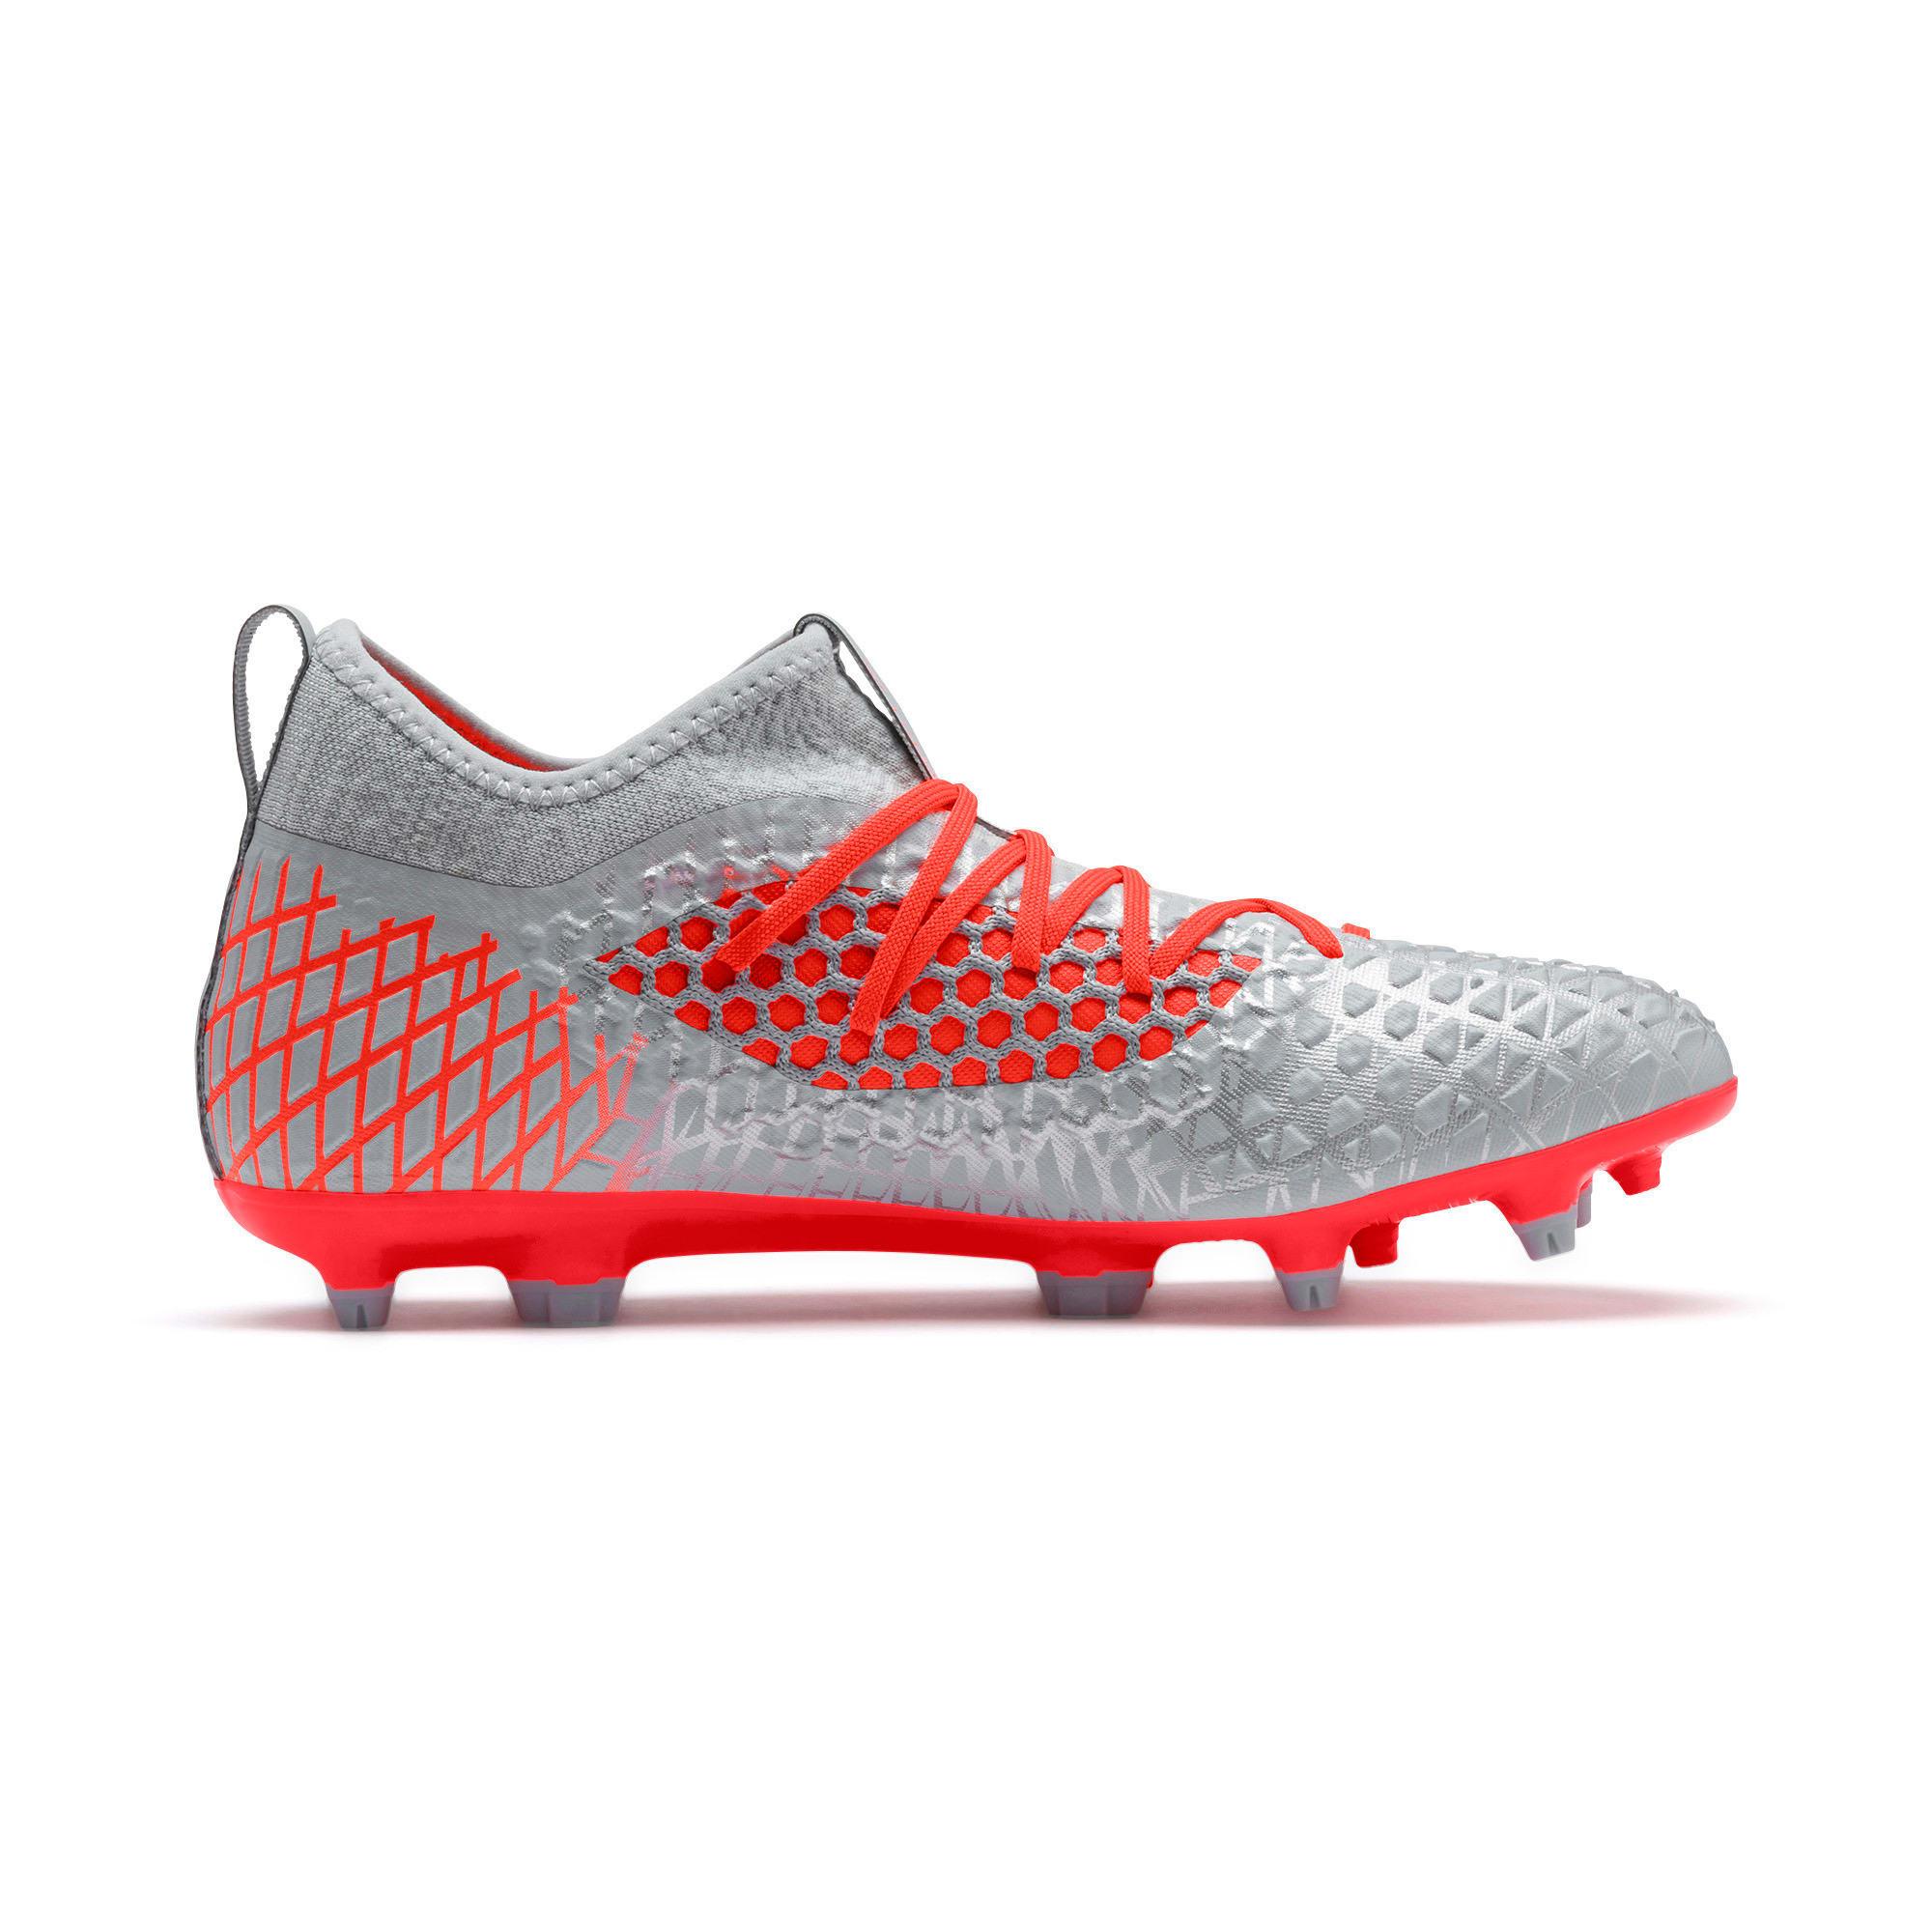 Thumbnail 6 of Chaussure de foot FUTURE 4.3 NETFIT FG/AG pour homme, Glacial Blue-Nrgy Red, medium